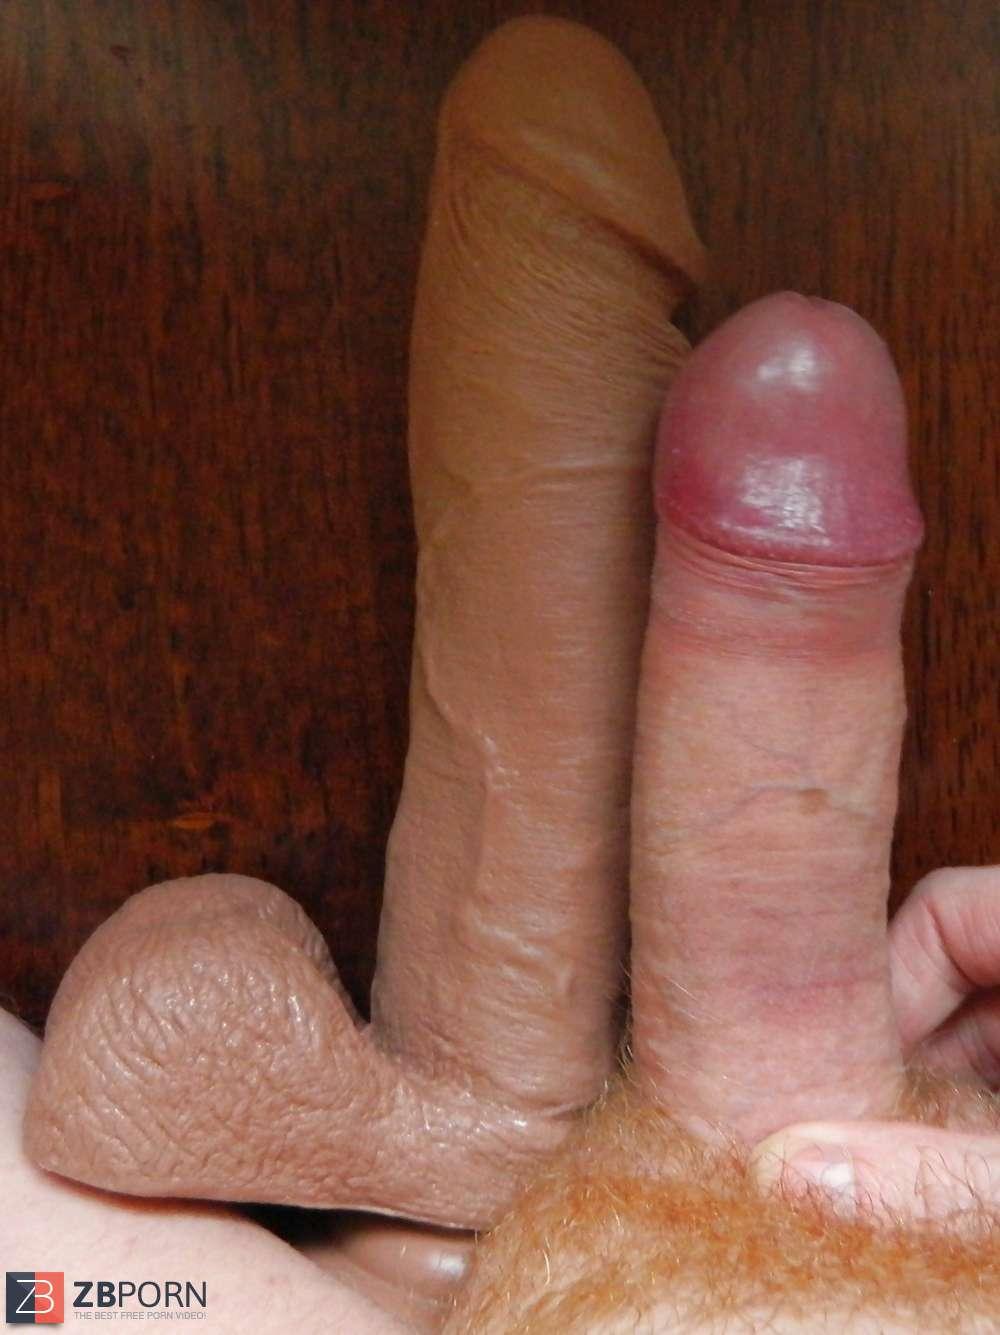 5 Inch Penis Porn